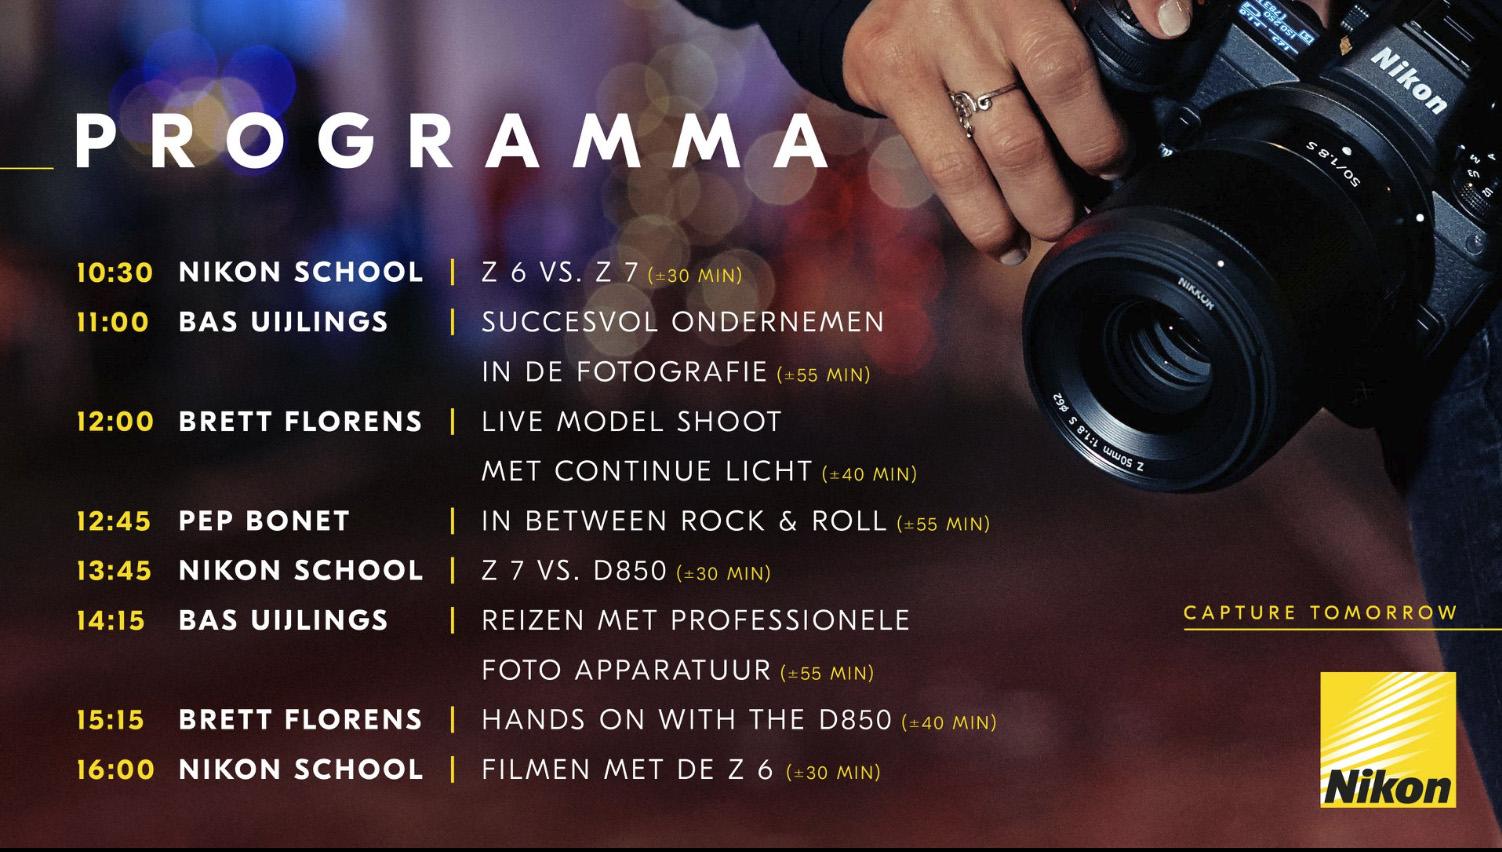 Programma Nikon-stand op Professional Imaging